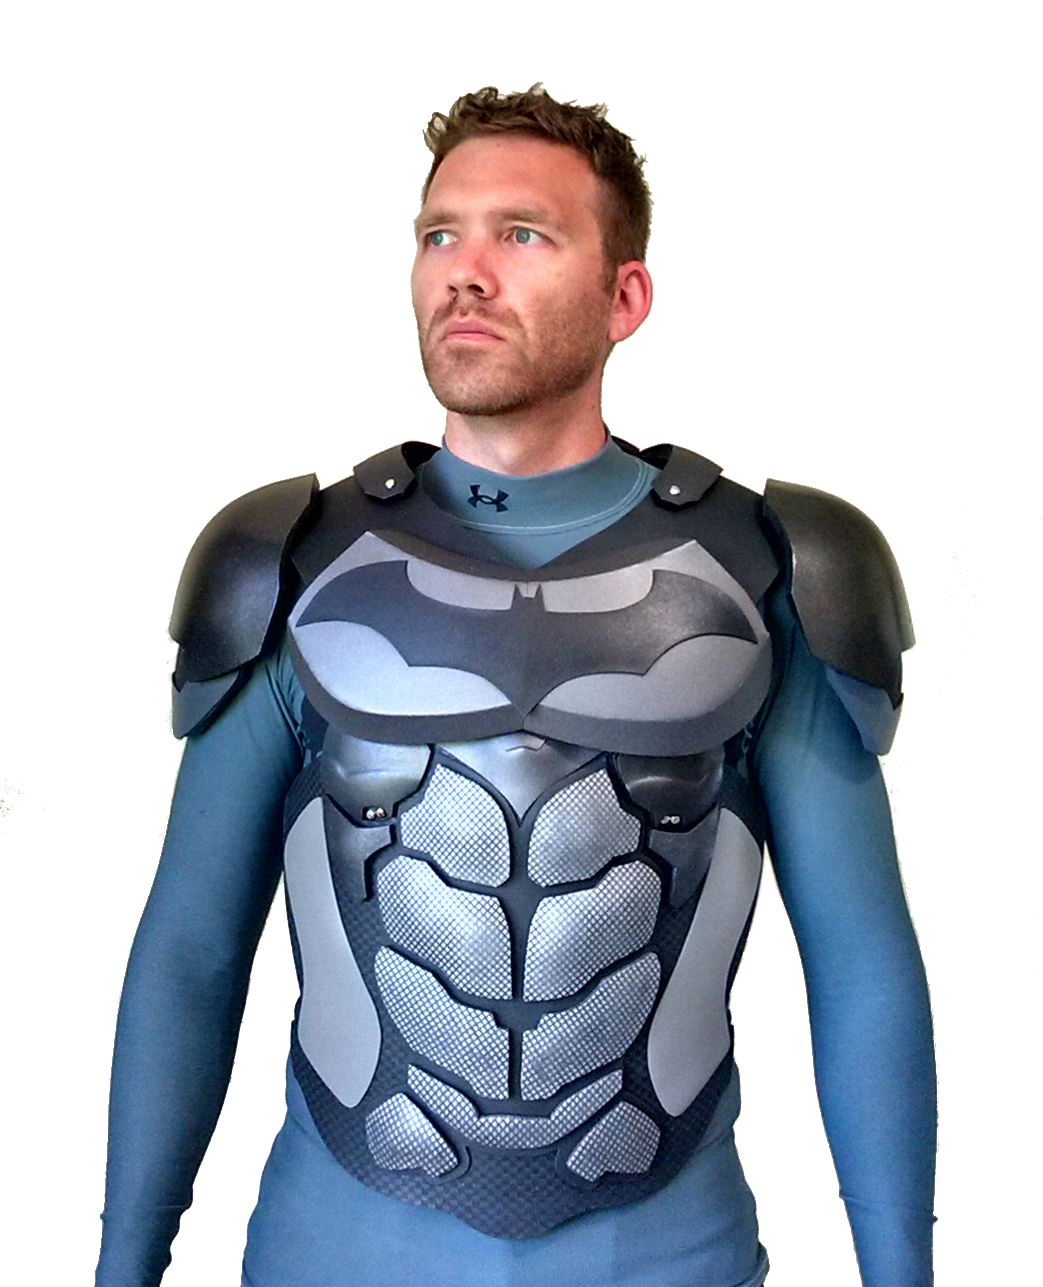 Batman Arkham Knight Foam Armor Tutorial Kit Ares Armory